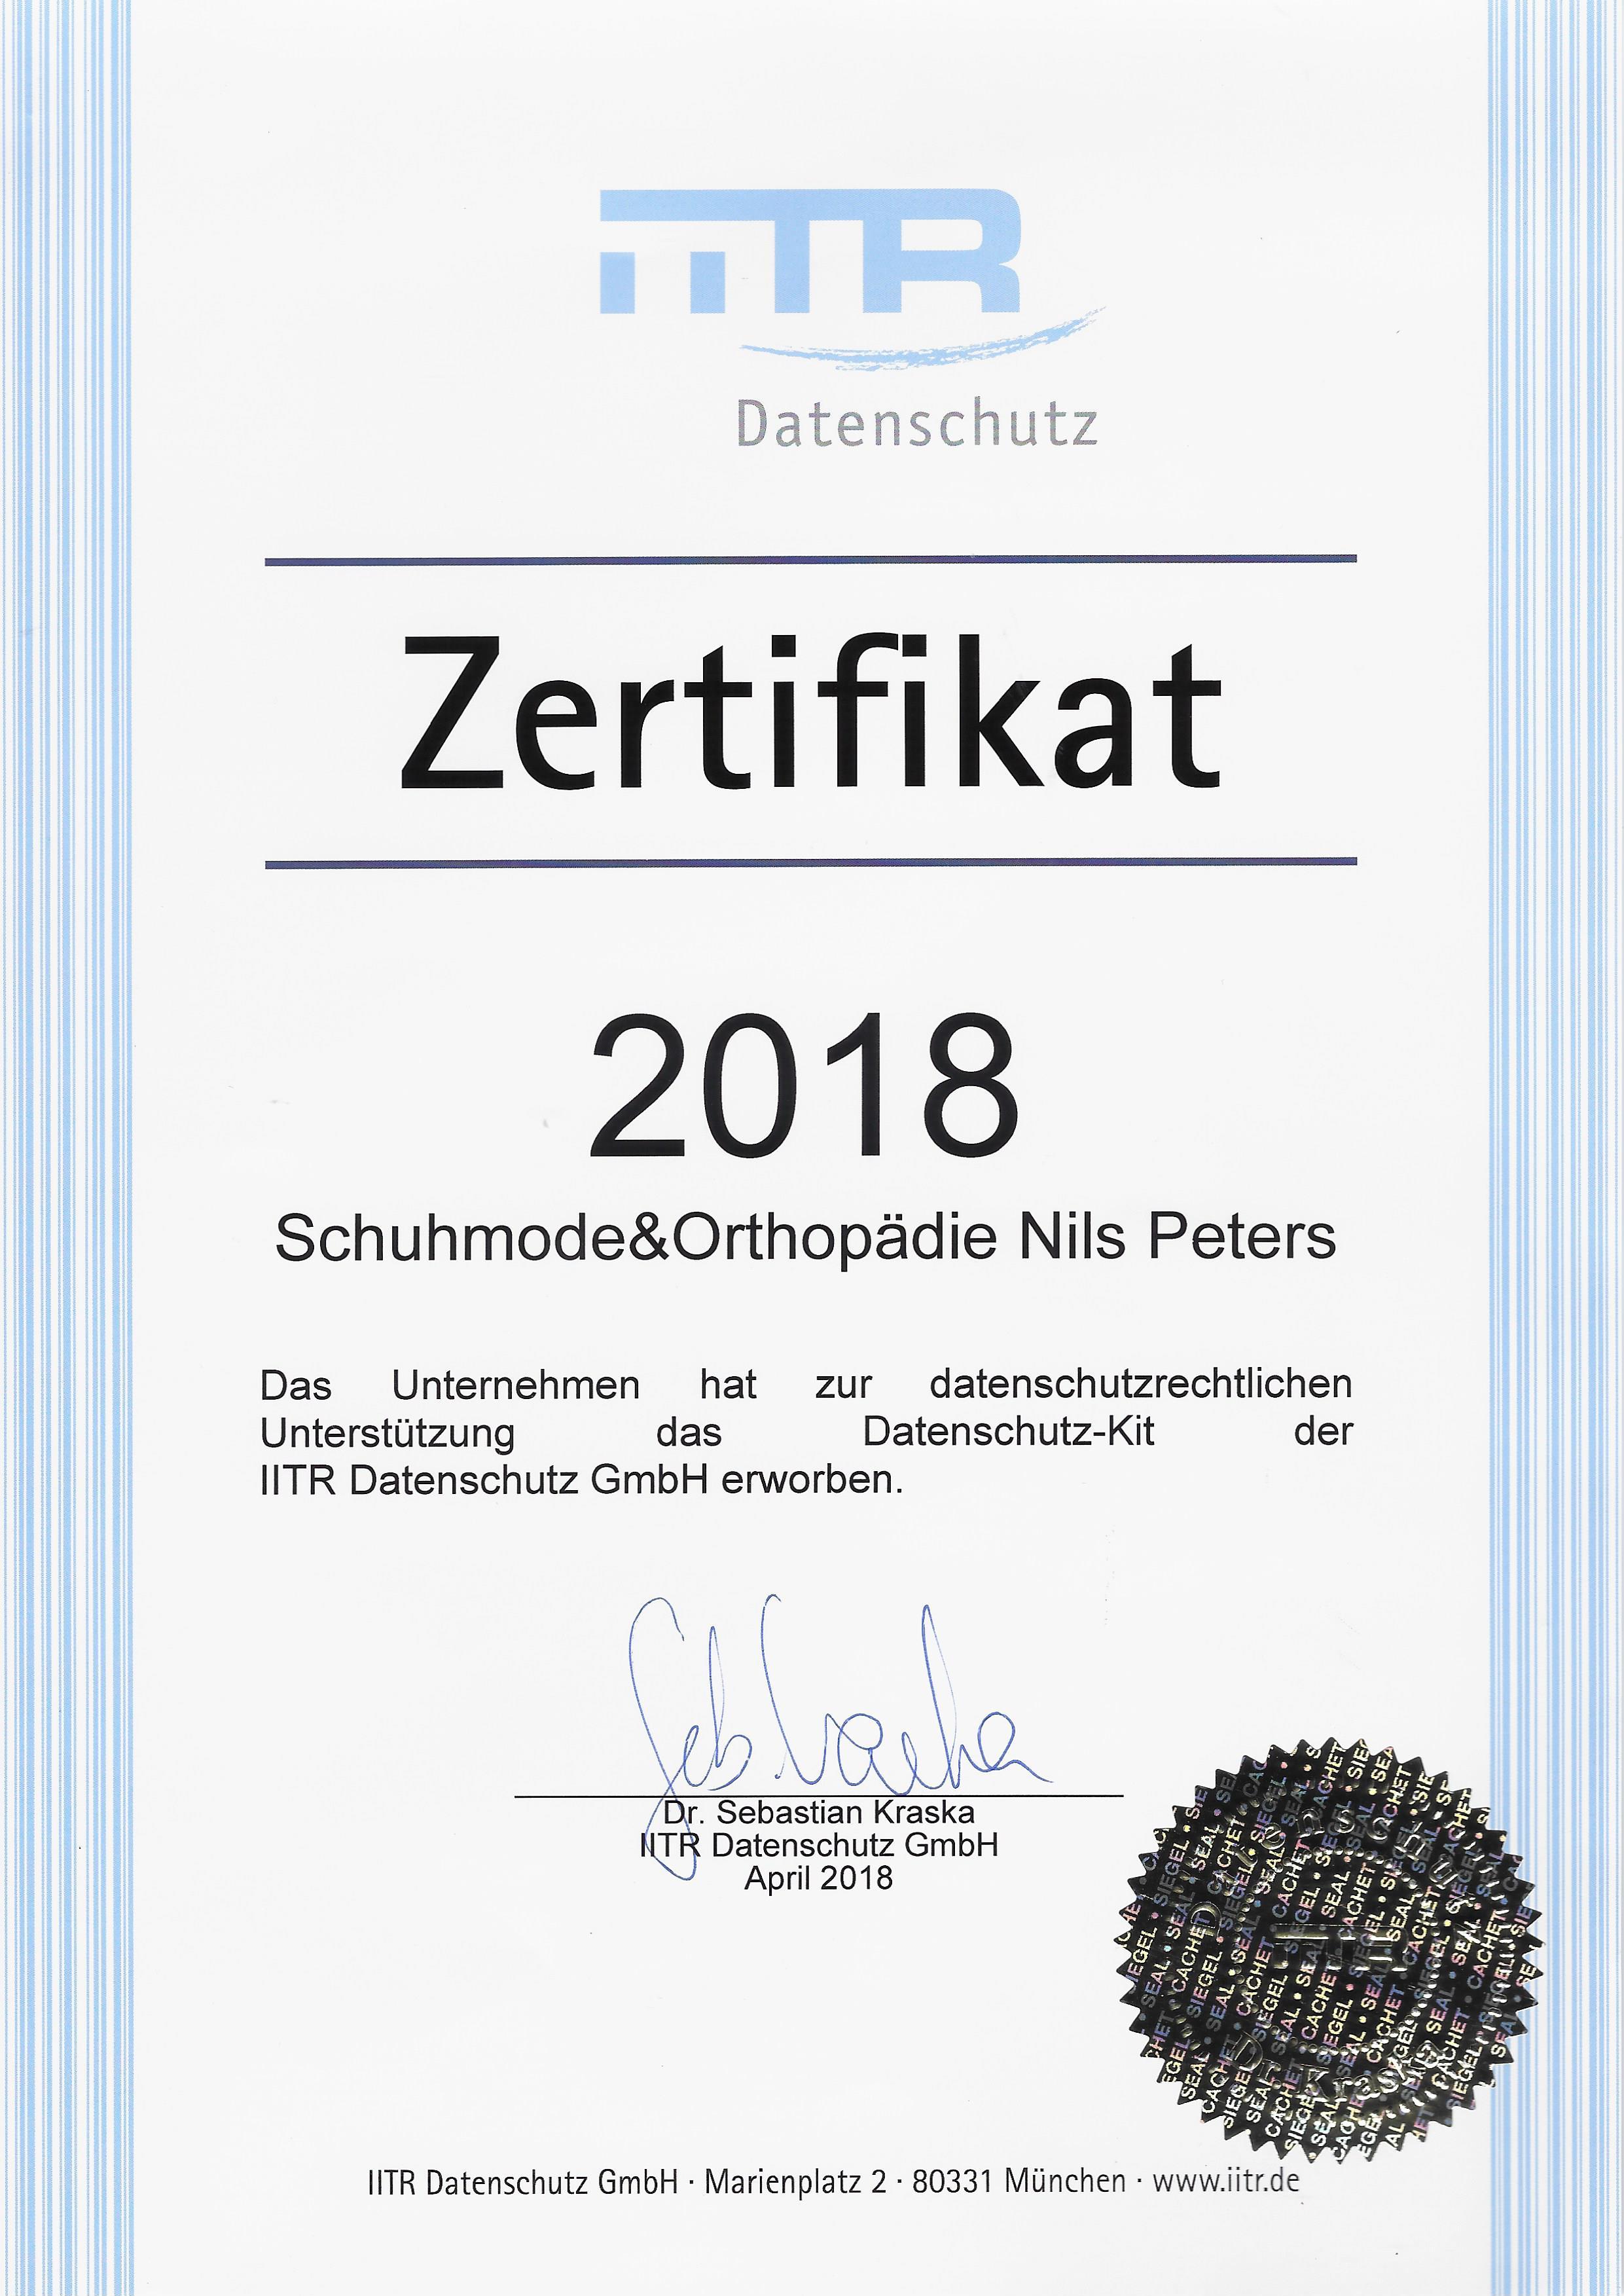 Groß Zertifikat Druckbare Vorlagen Galerie - Entry Level Resume ...